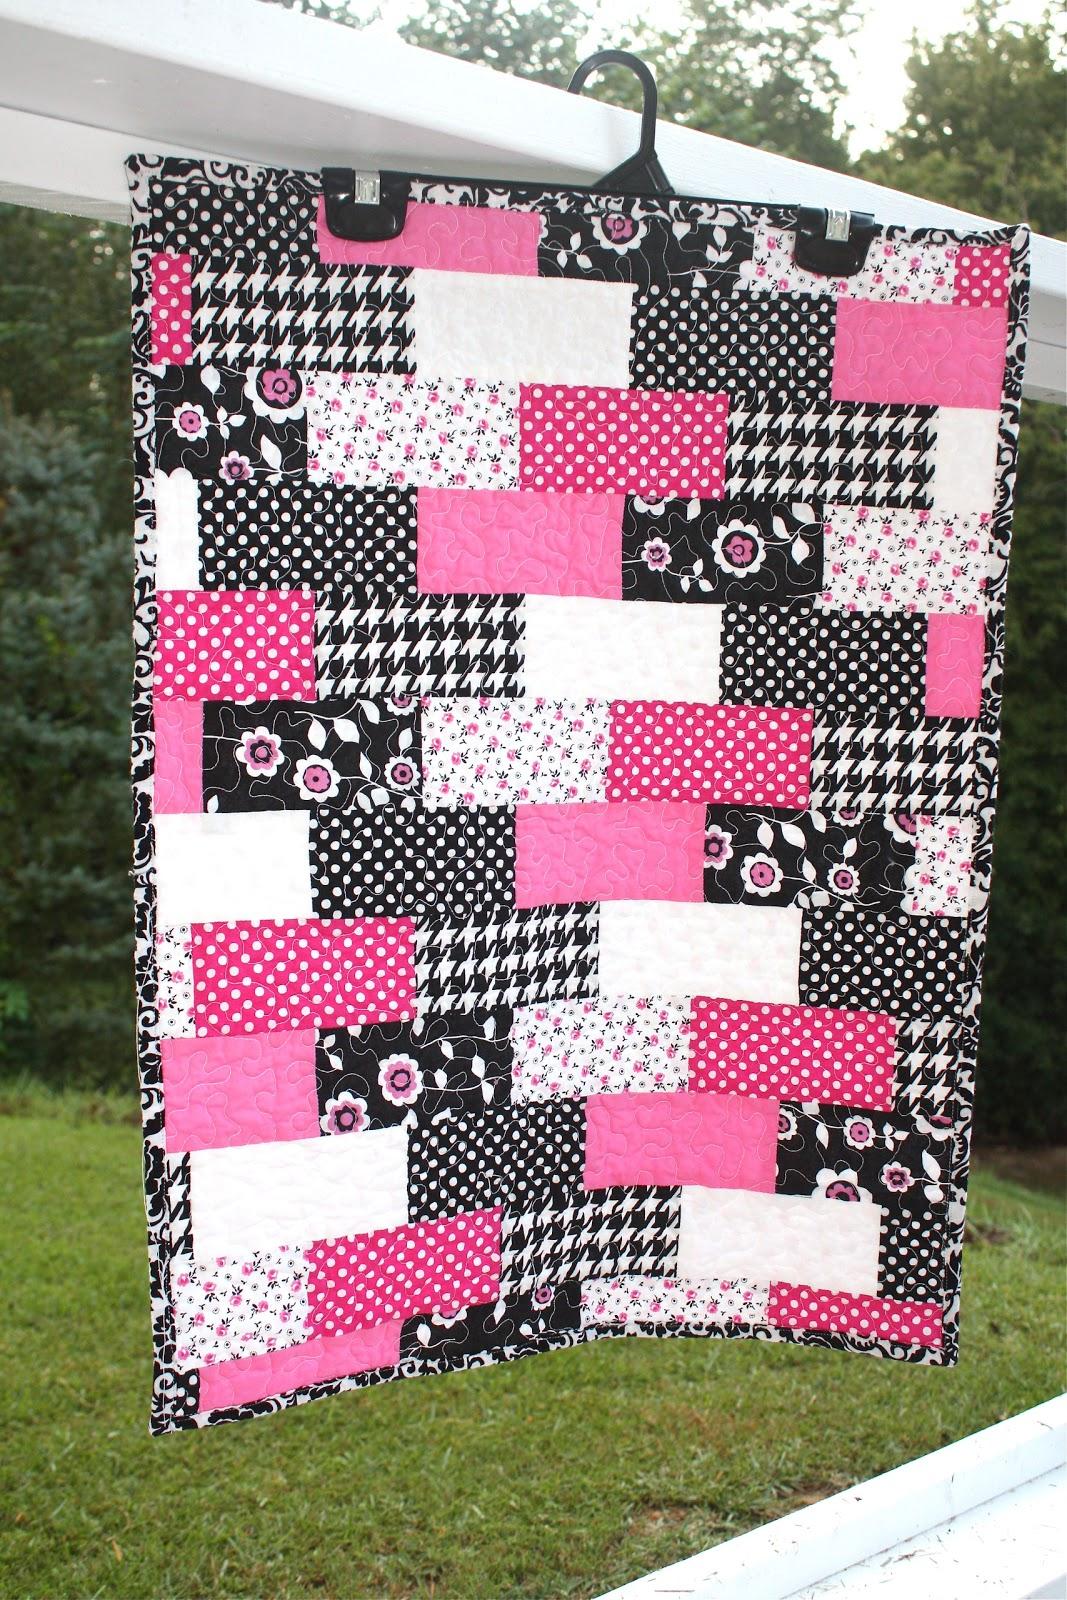 Designing Tomorrow – Baby Changing Quilt: Girlie Girl Brick | Wee ... : brick quilt - Adamdwight.com